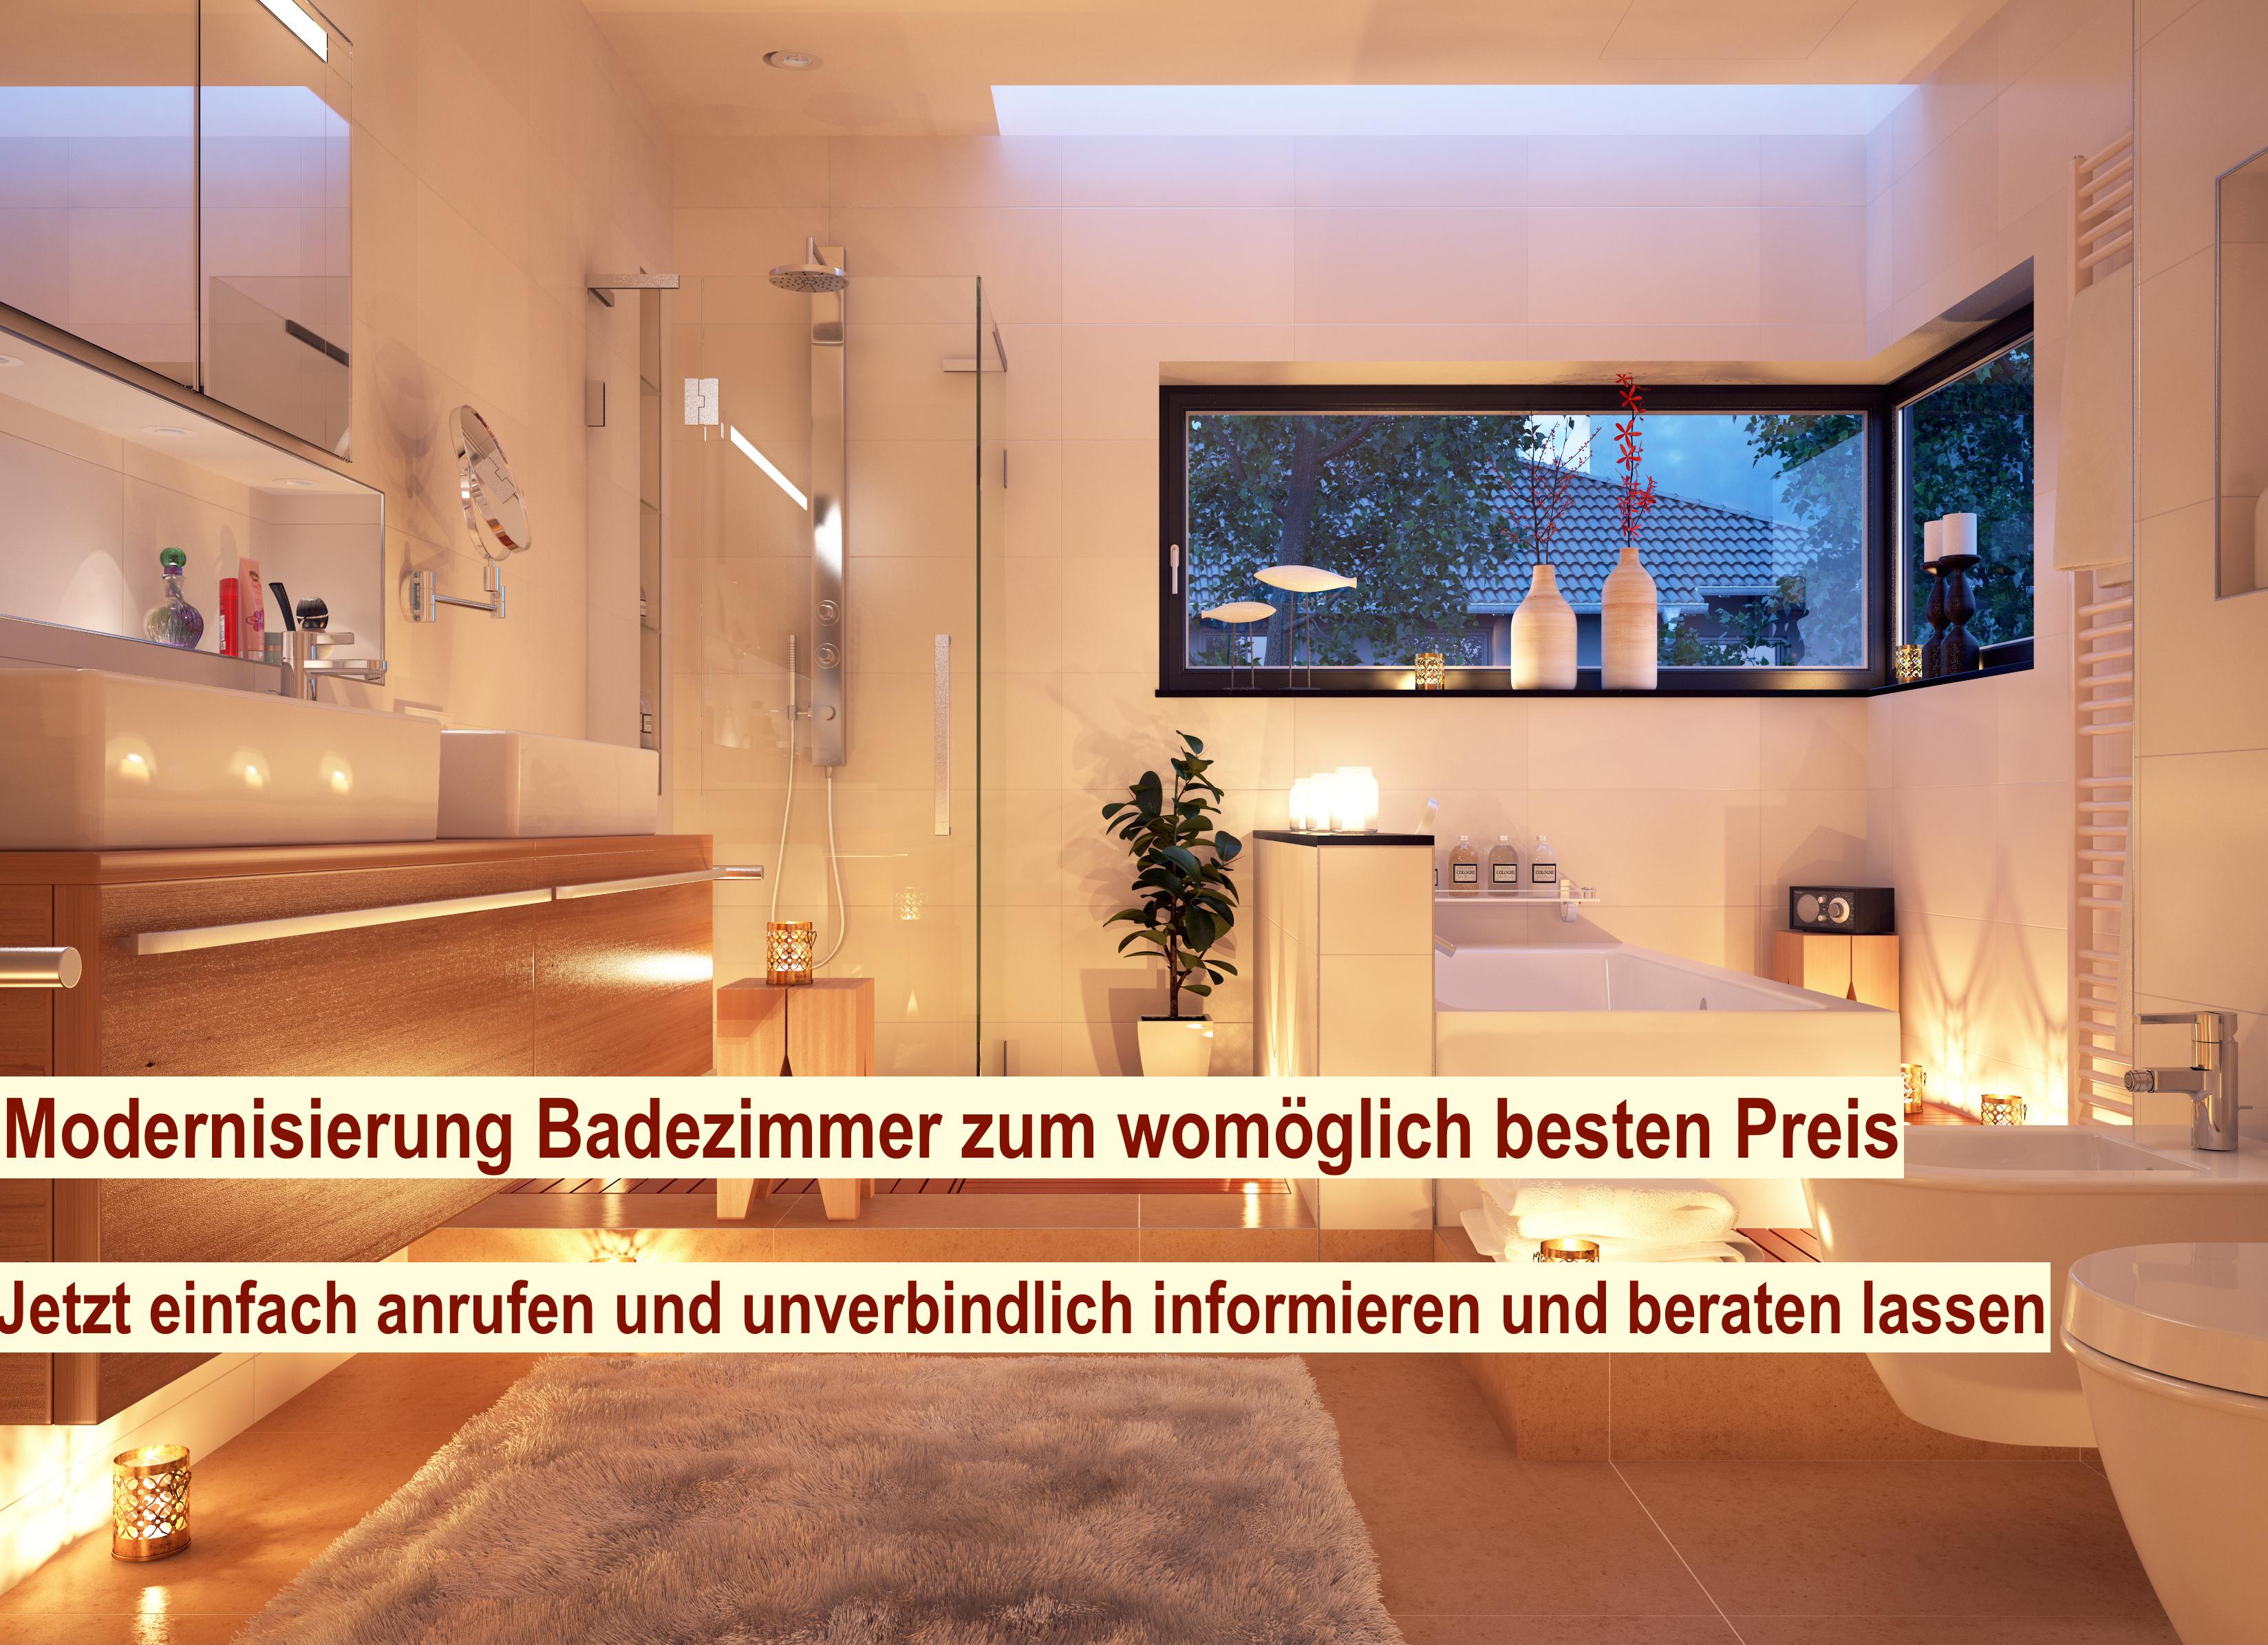 Modernisierung Badezimmer Berlin - Bad modernisieren